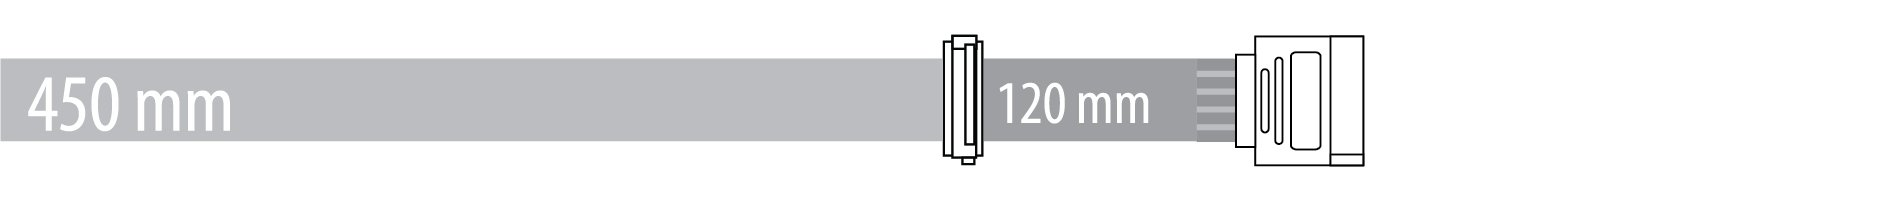 SATA 450 + 120 mm